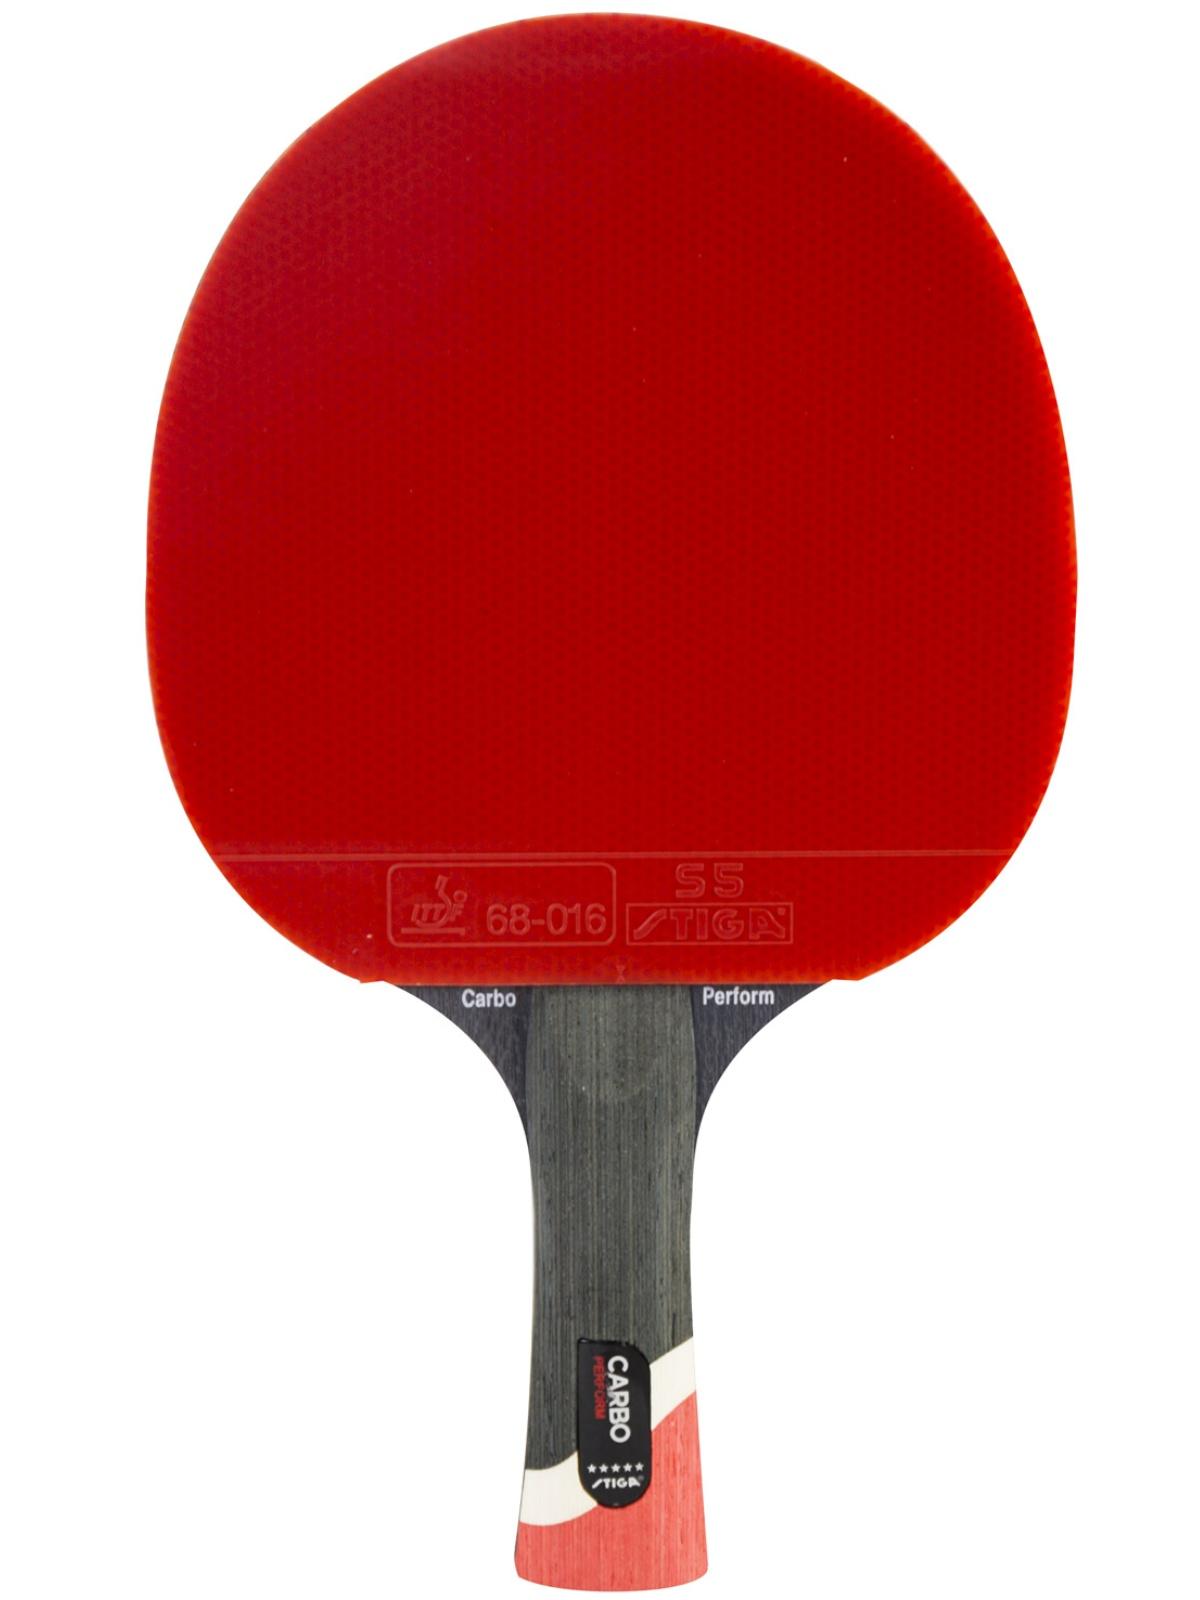 Raketa na stolný tenis STIGA Carbo Perform